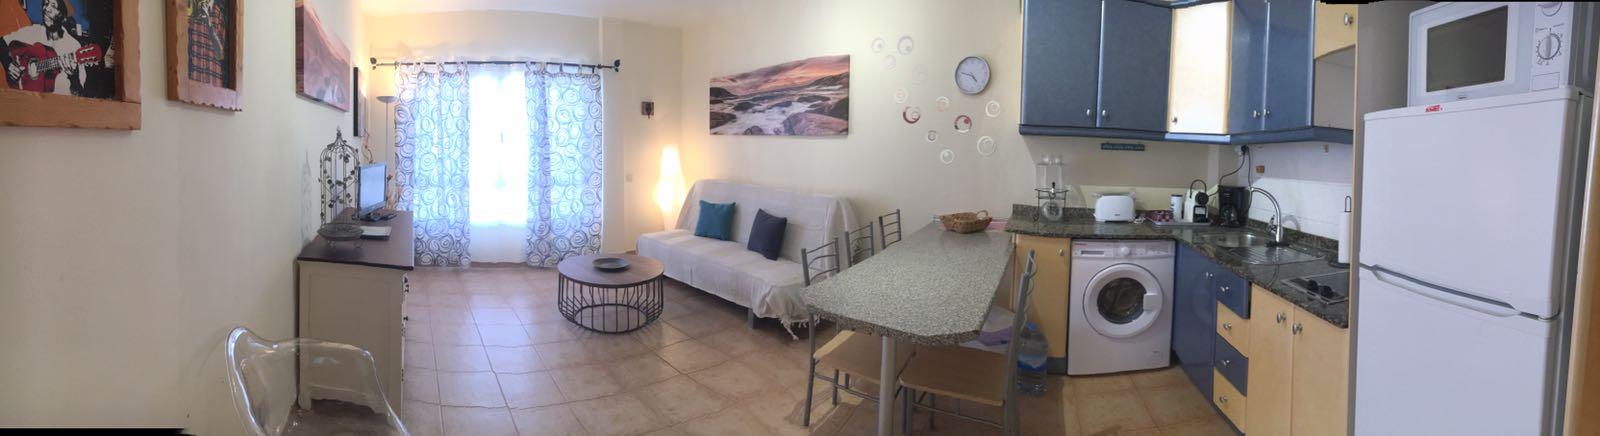 Apartment in Torremar Building